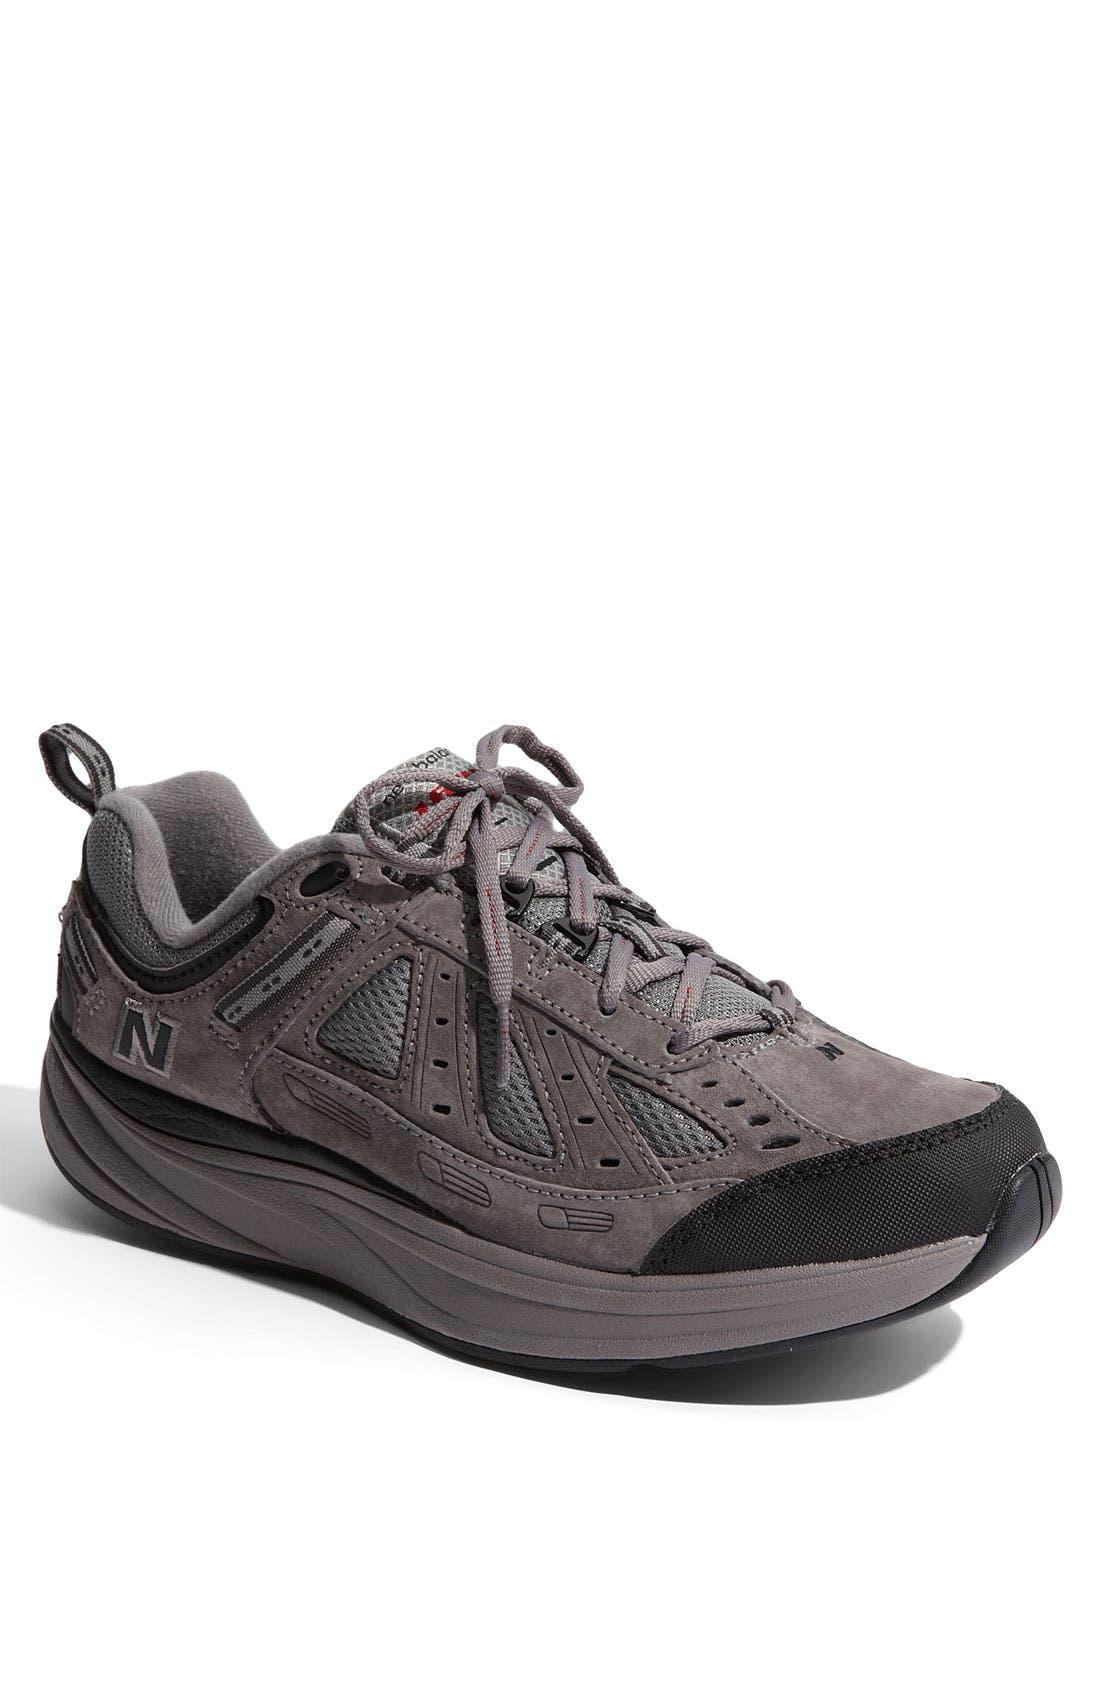 '1645' Toning Shoe,                             Main thumbnail 1, color,                             030